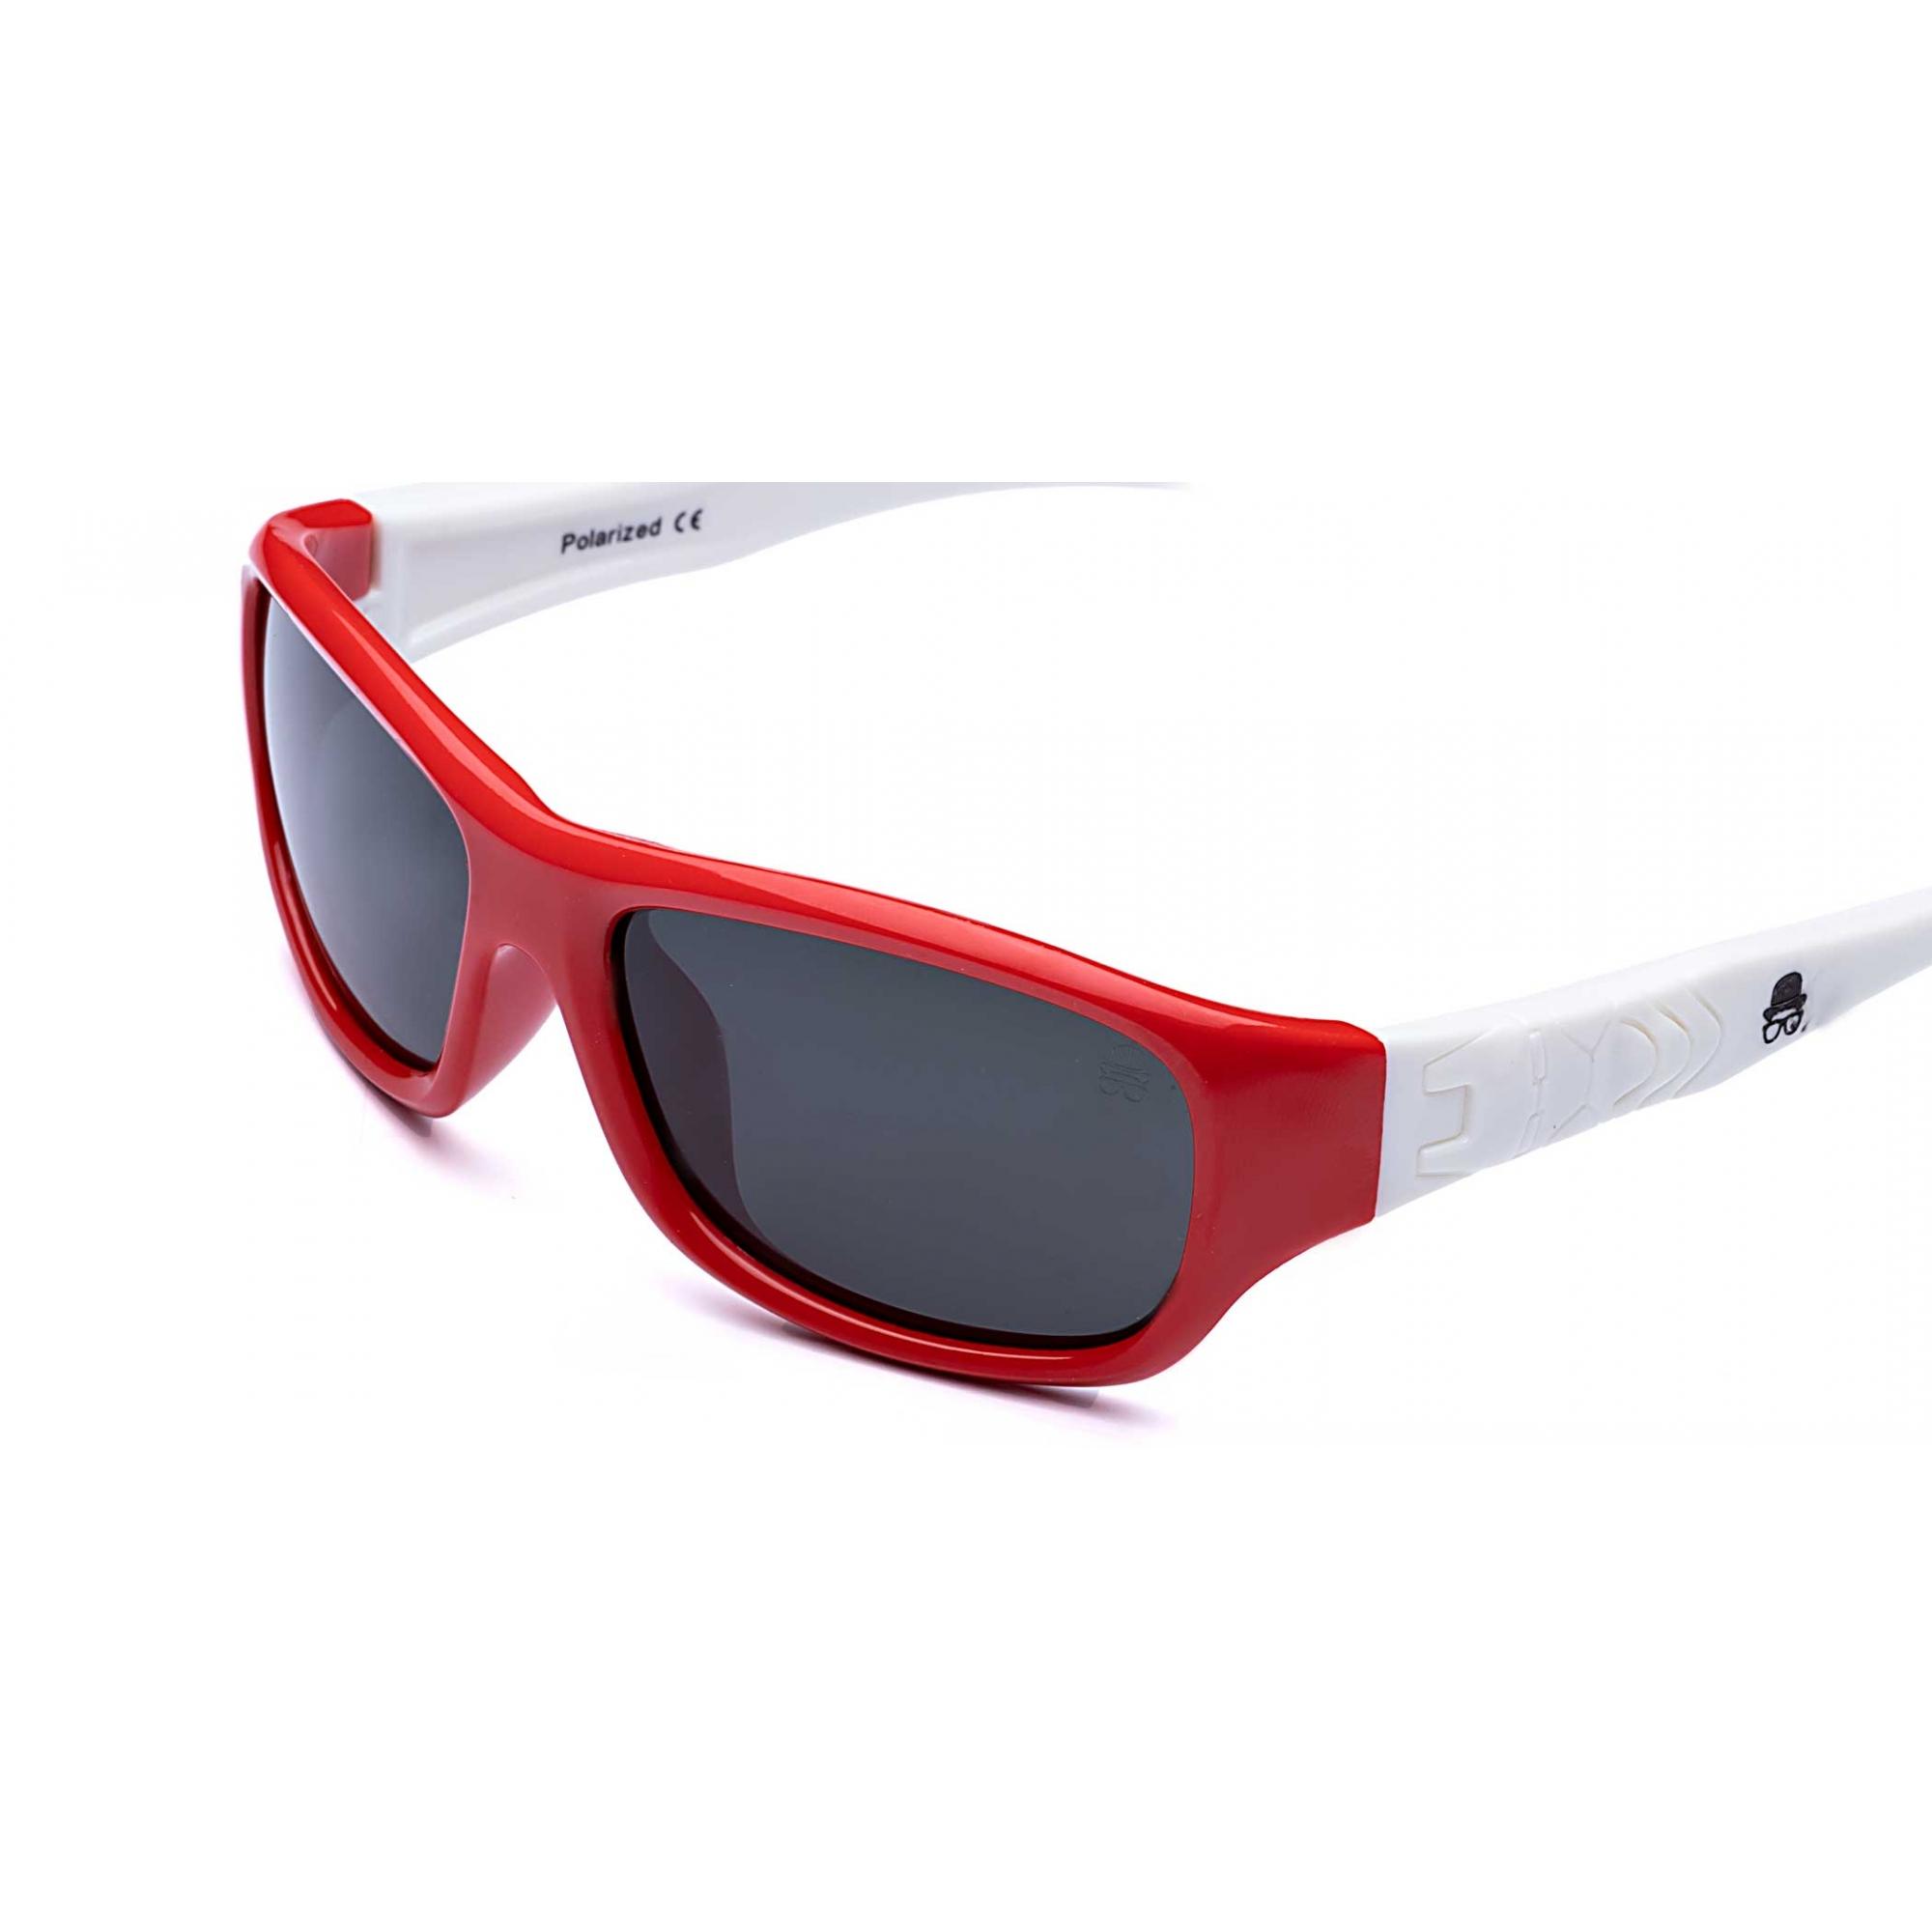 Óculos de Sol Duck Rafael Lopes Eyewear - Infantil